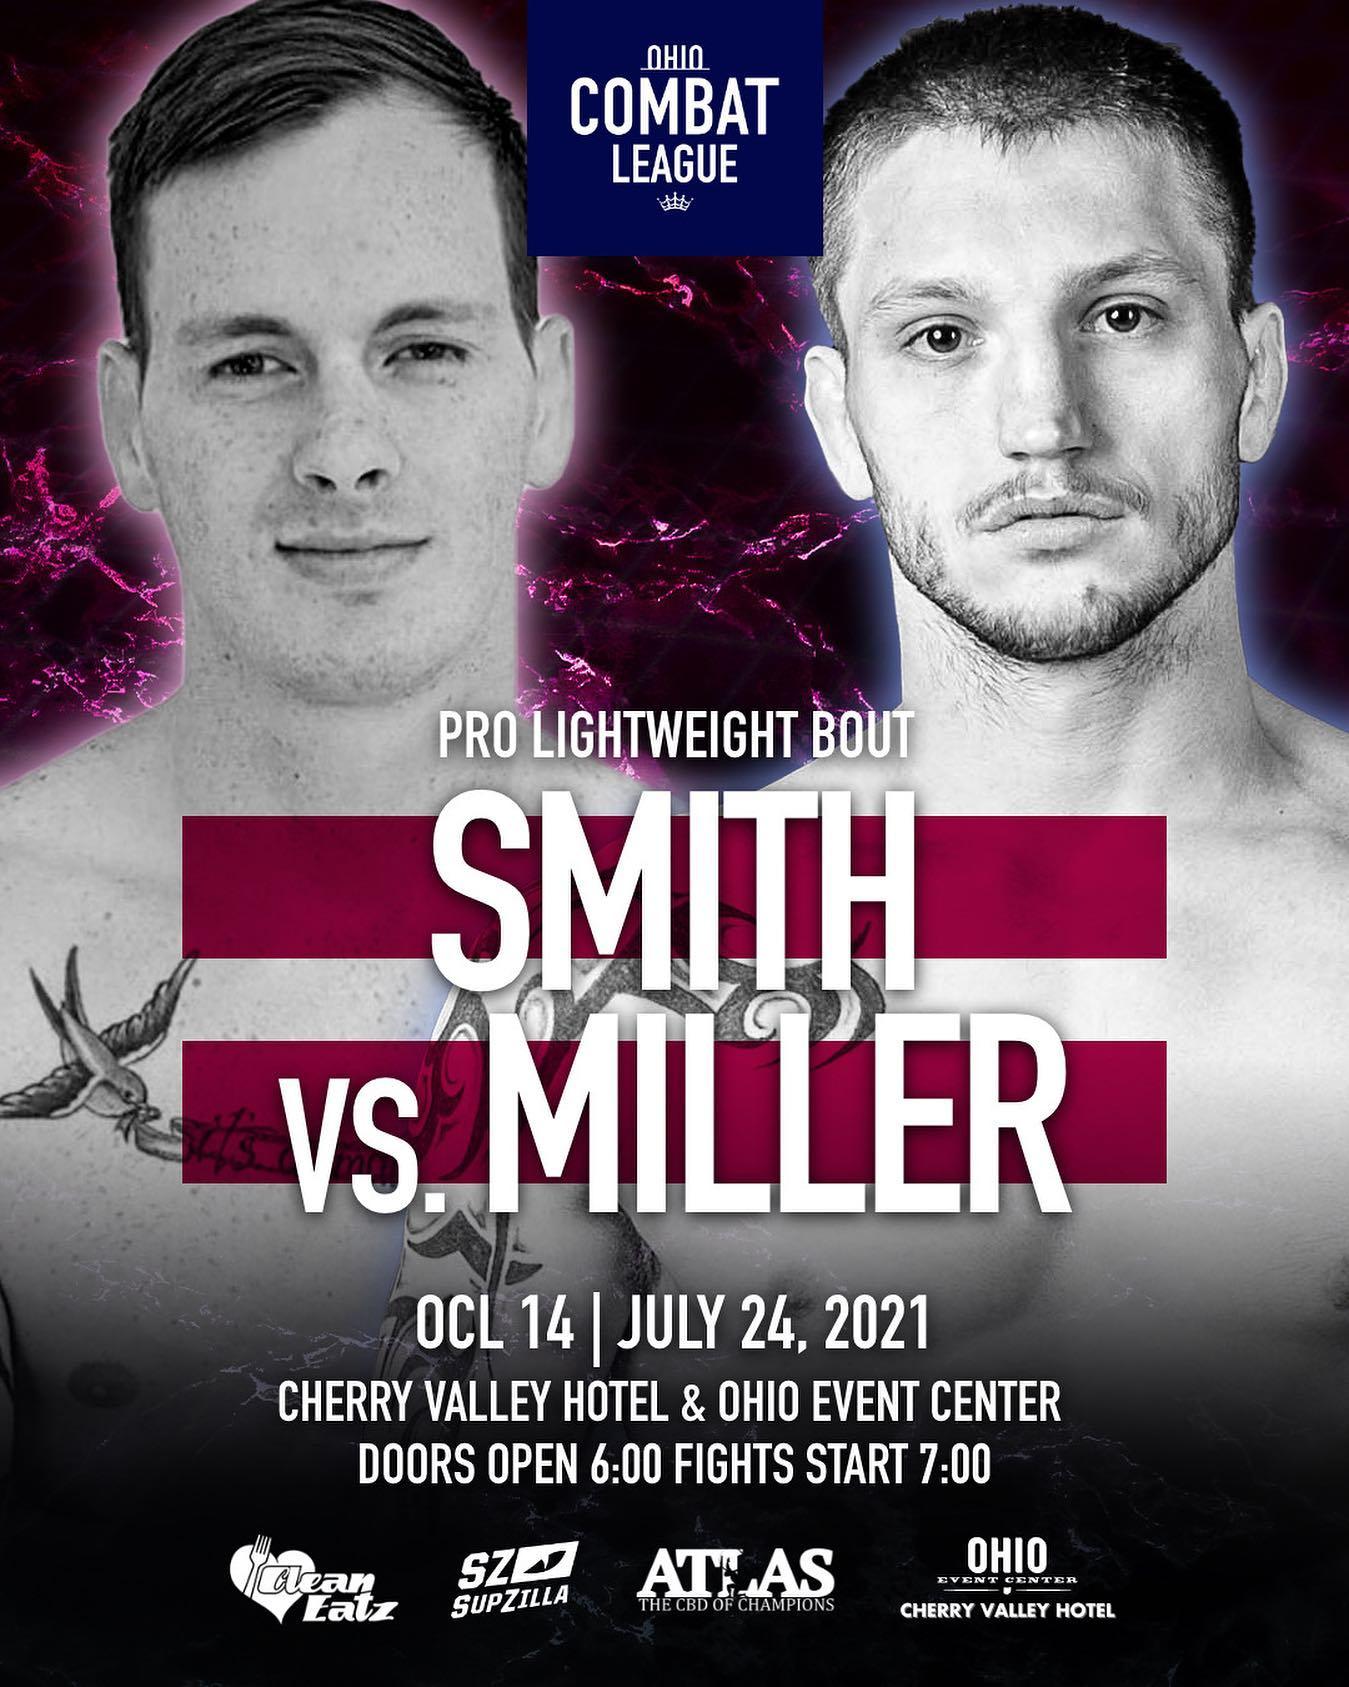 Ohio Combat League, OCL 14, Ohio Combat League 14, Jake Miller